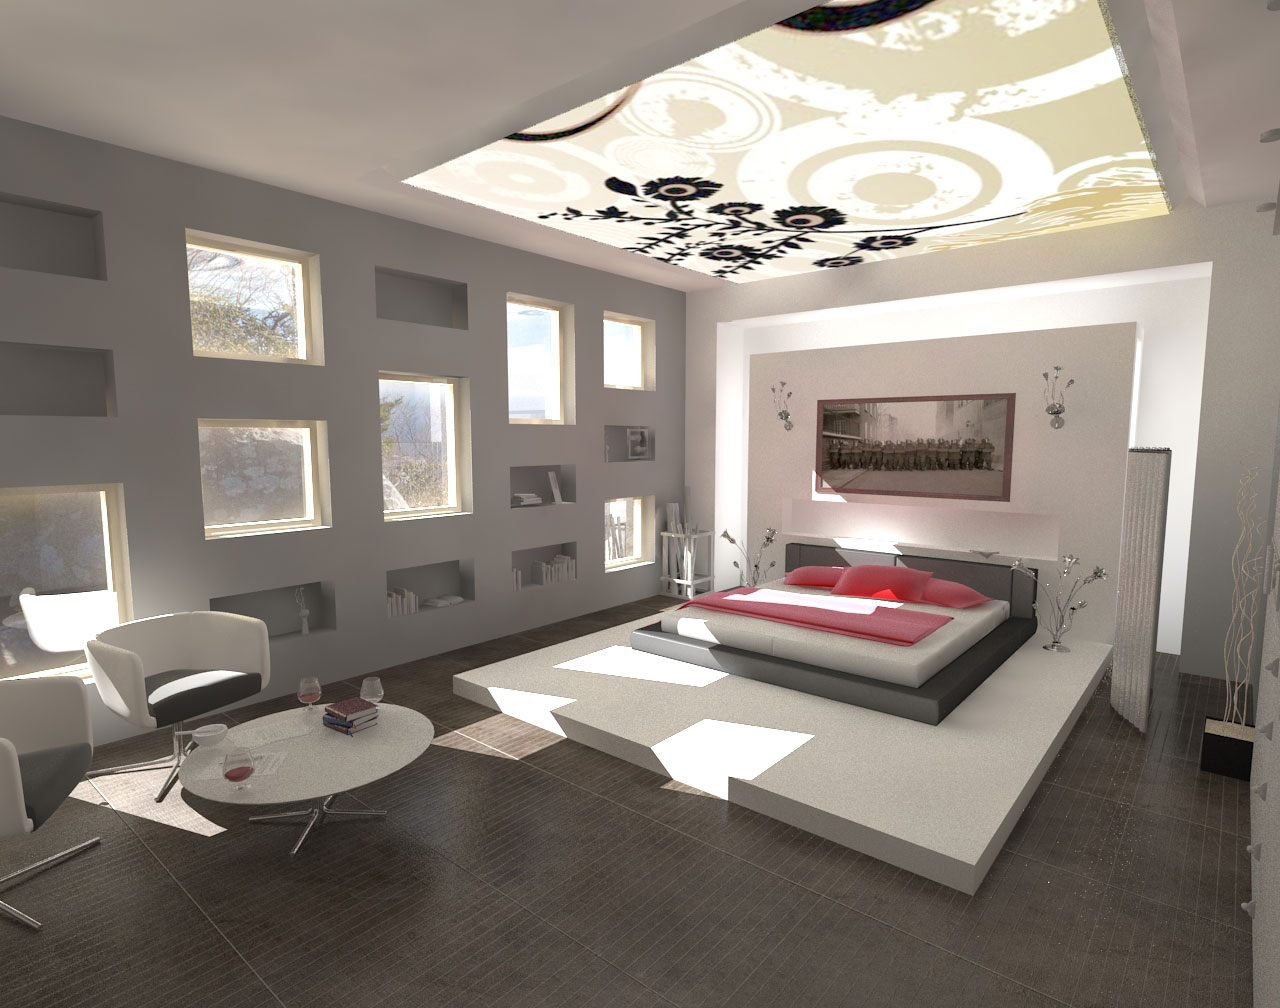 Decorations: Minimalist Design